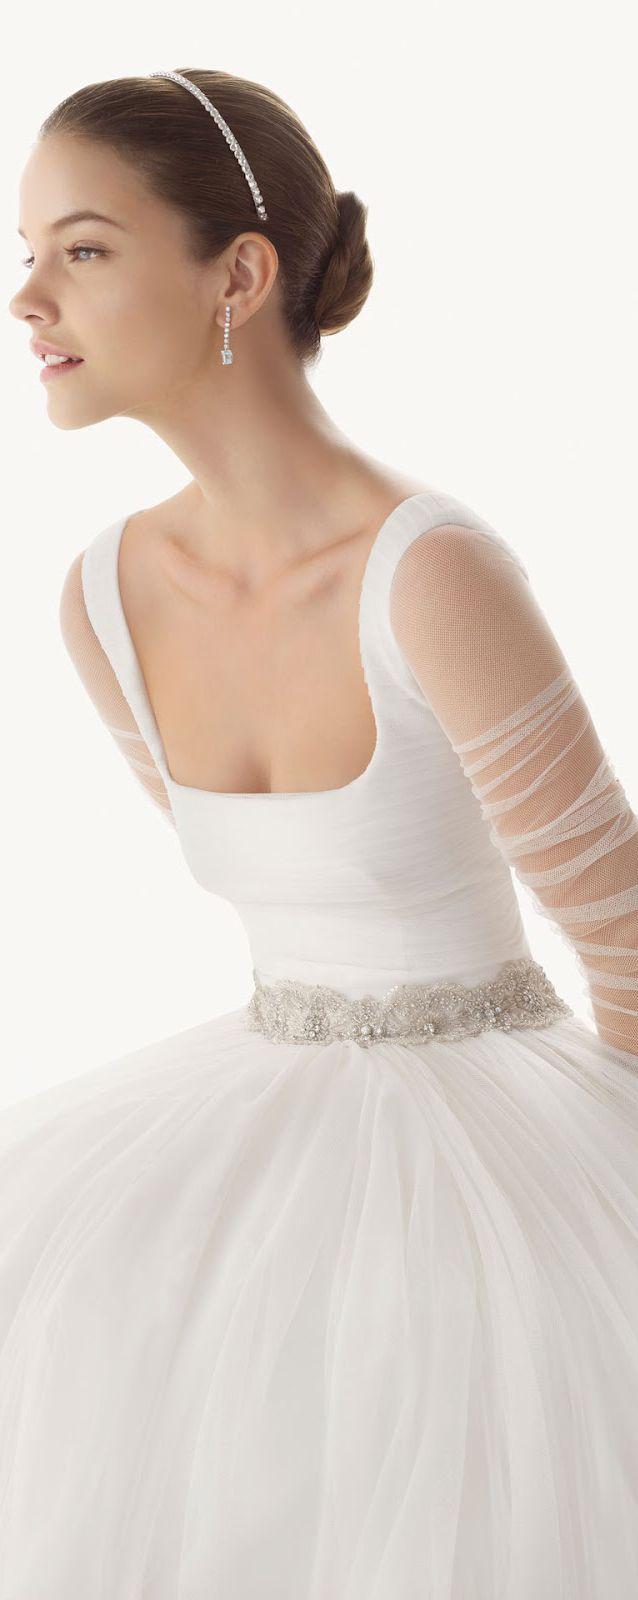 Wedding: Long Sleeve Dresses BELINDA <3